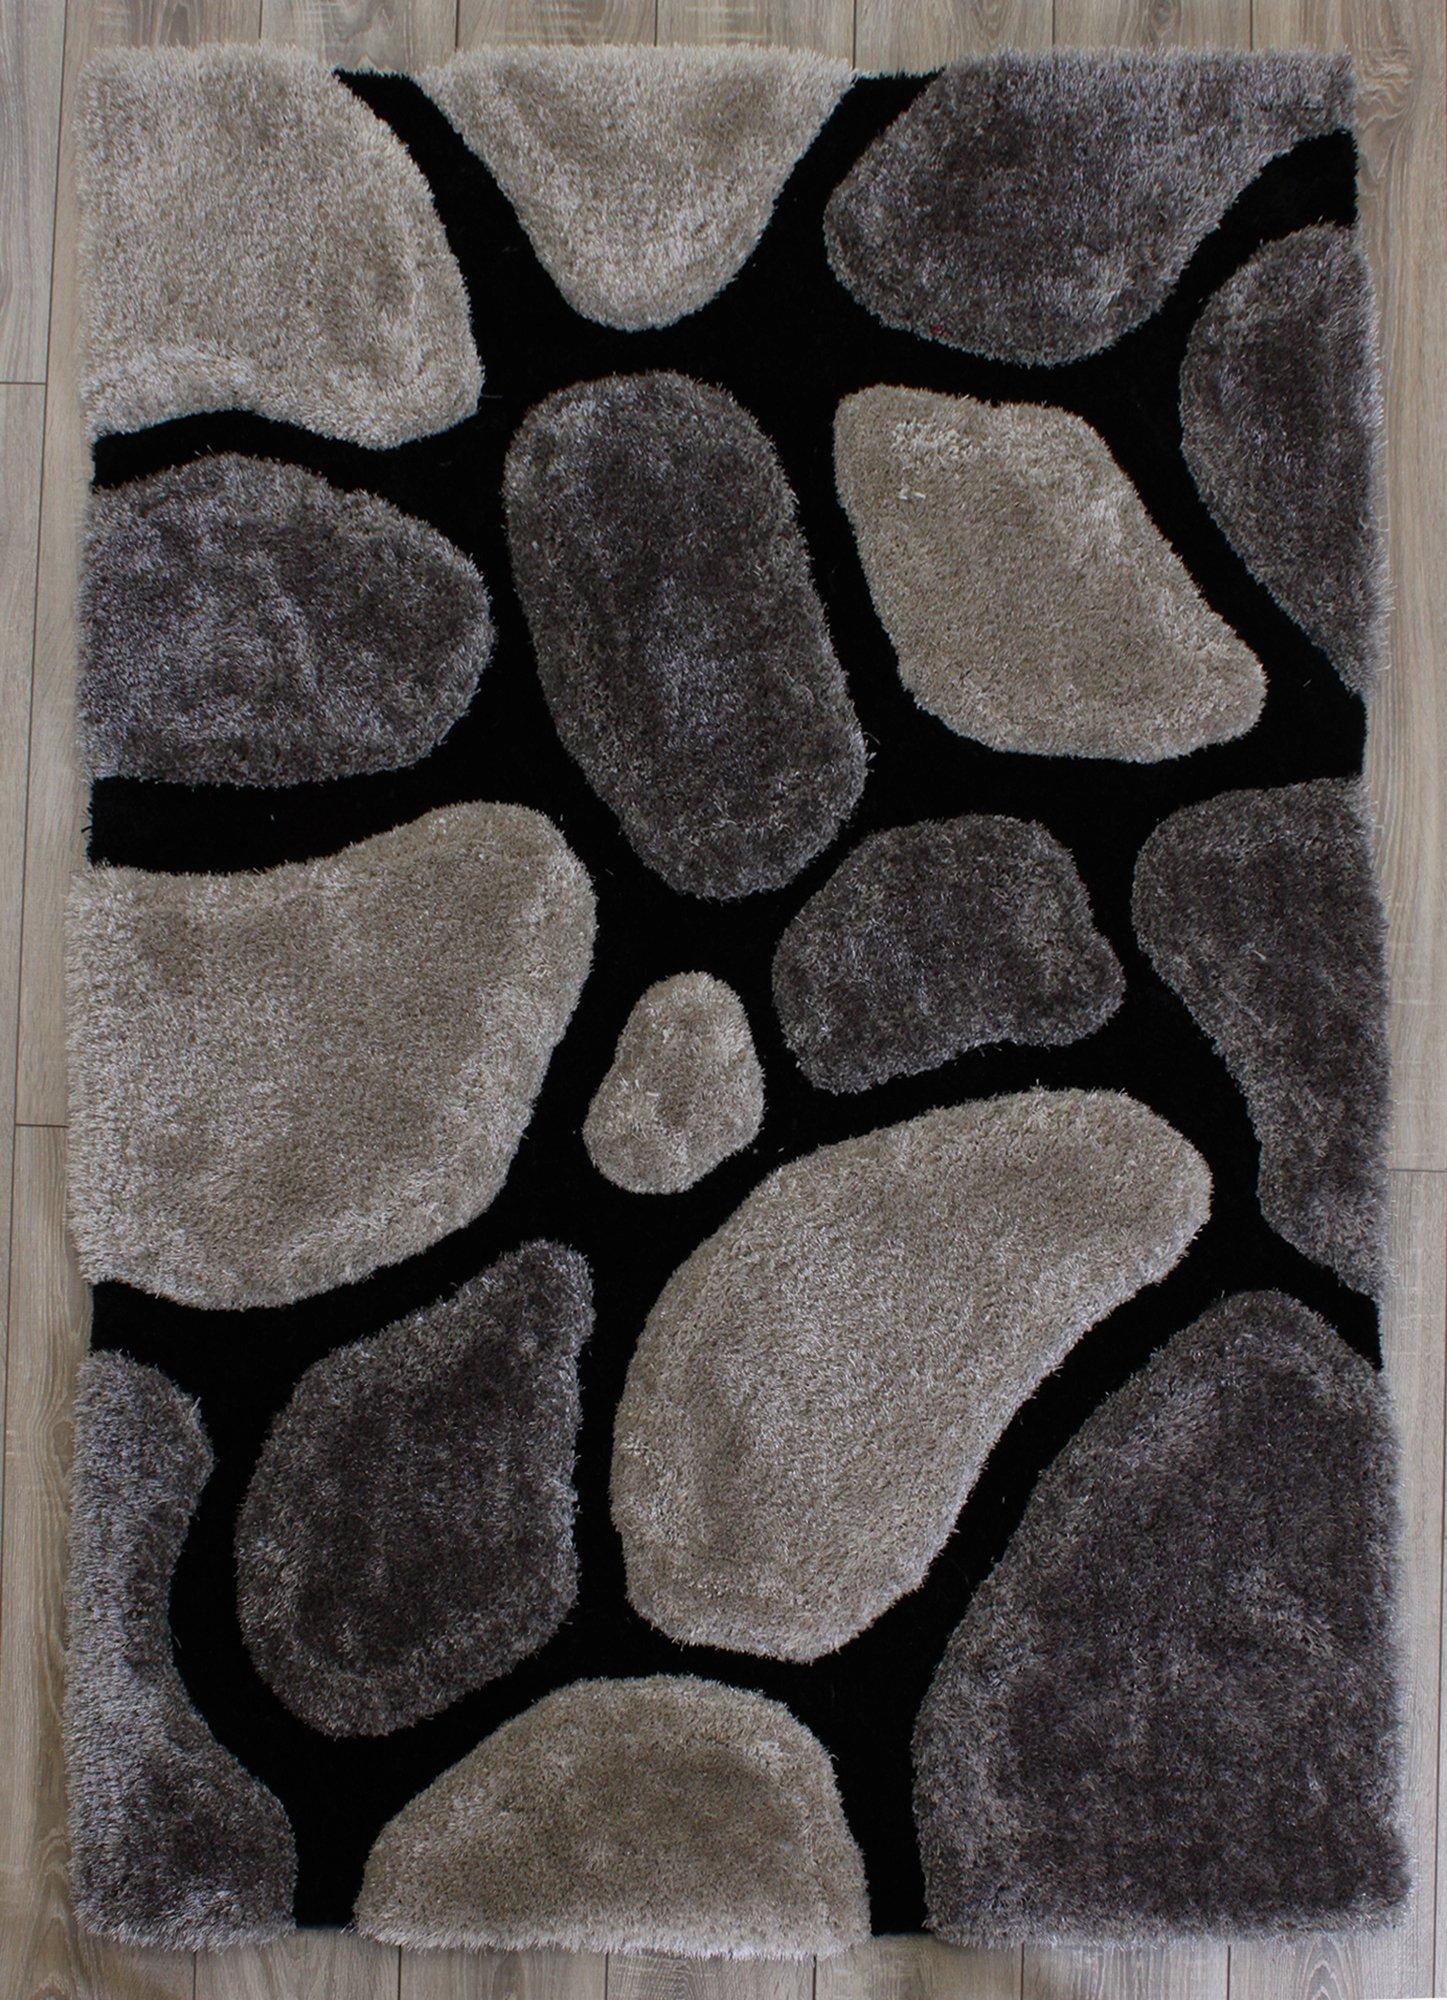 3D Stepping Stone Rug - 120x170cm - Black.